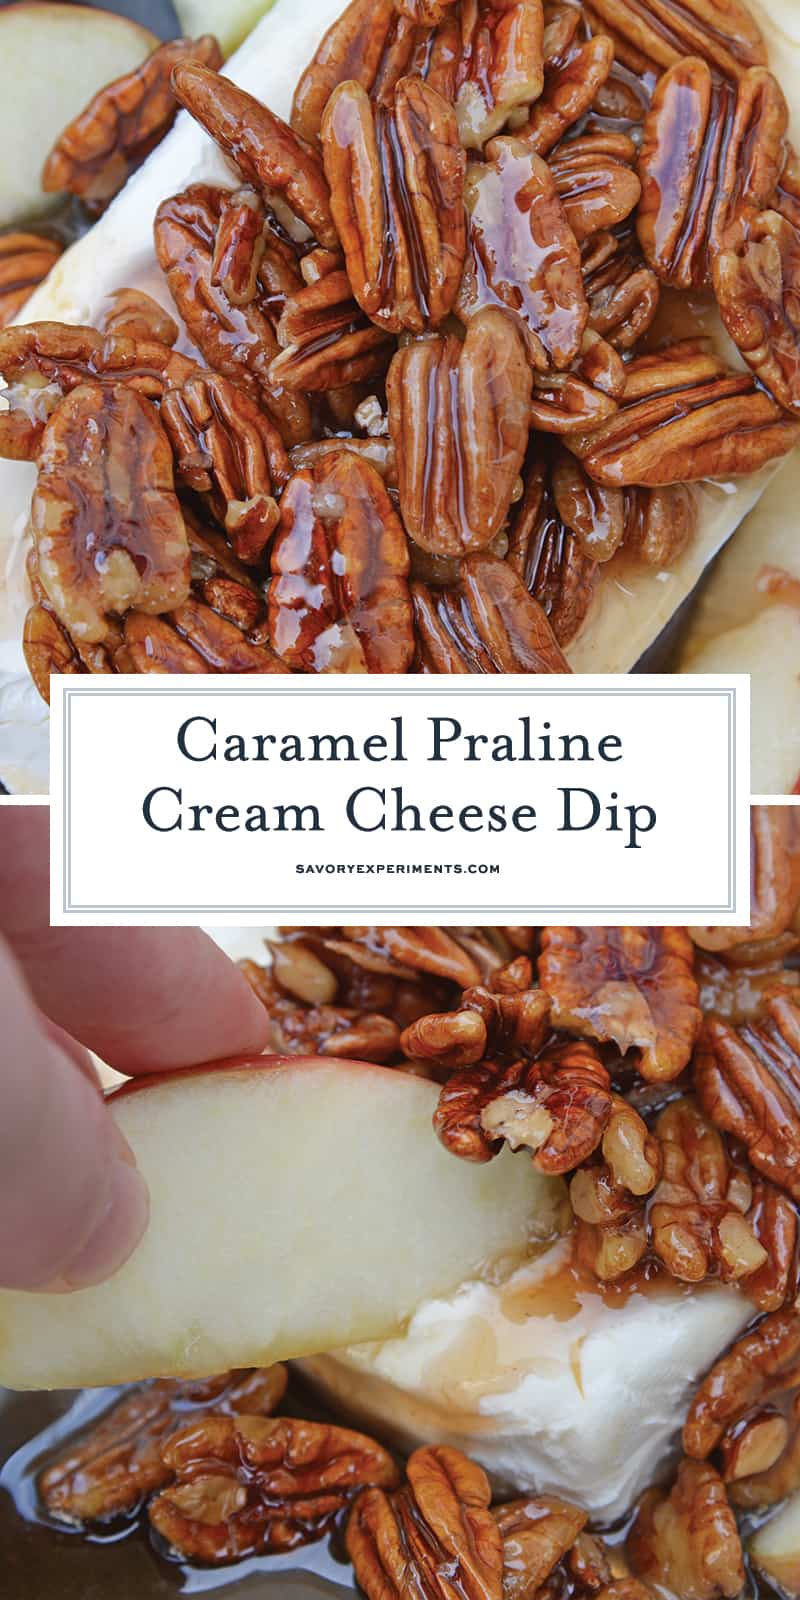 Caramel Praline Cream Cheese Dip for Pinterest